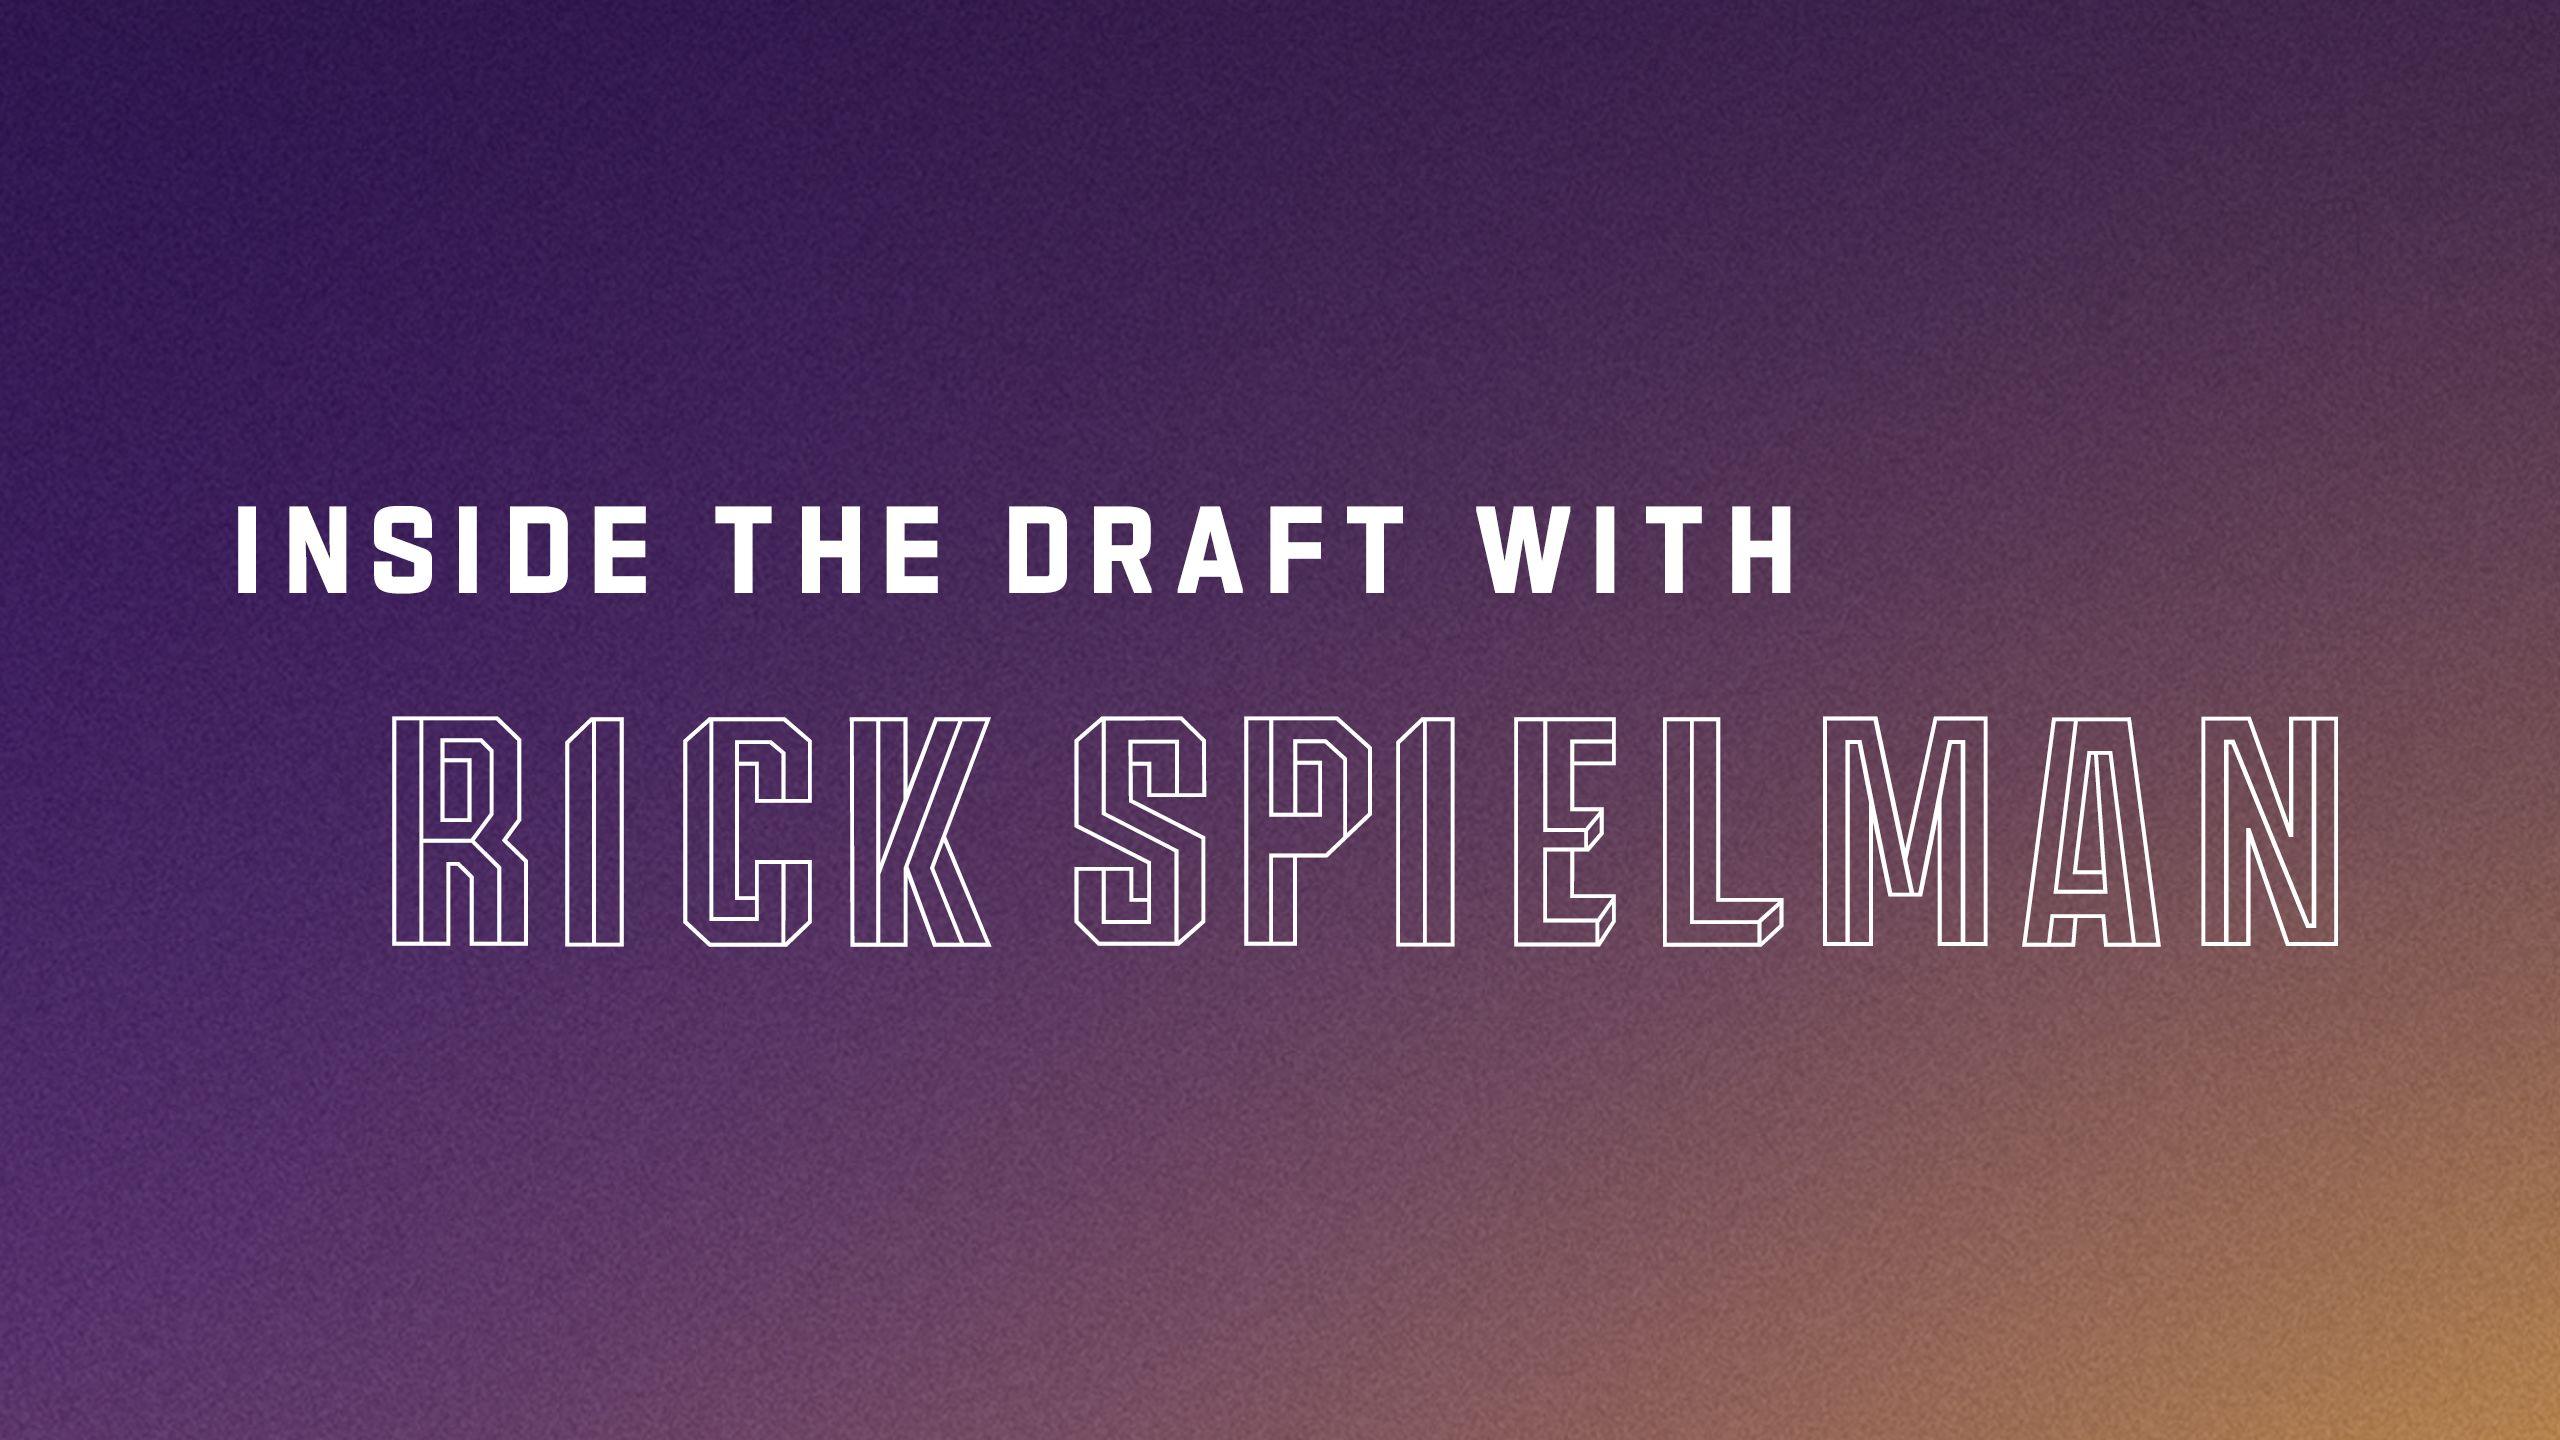 Inside the Draft with Rick Spielman